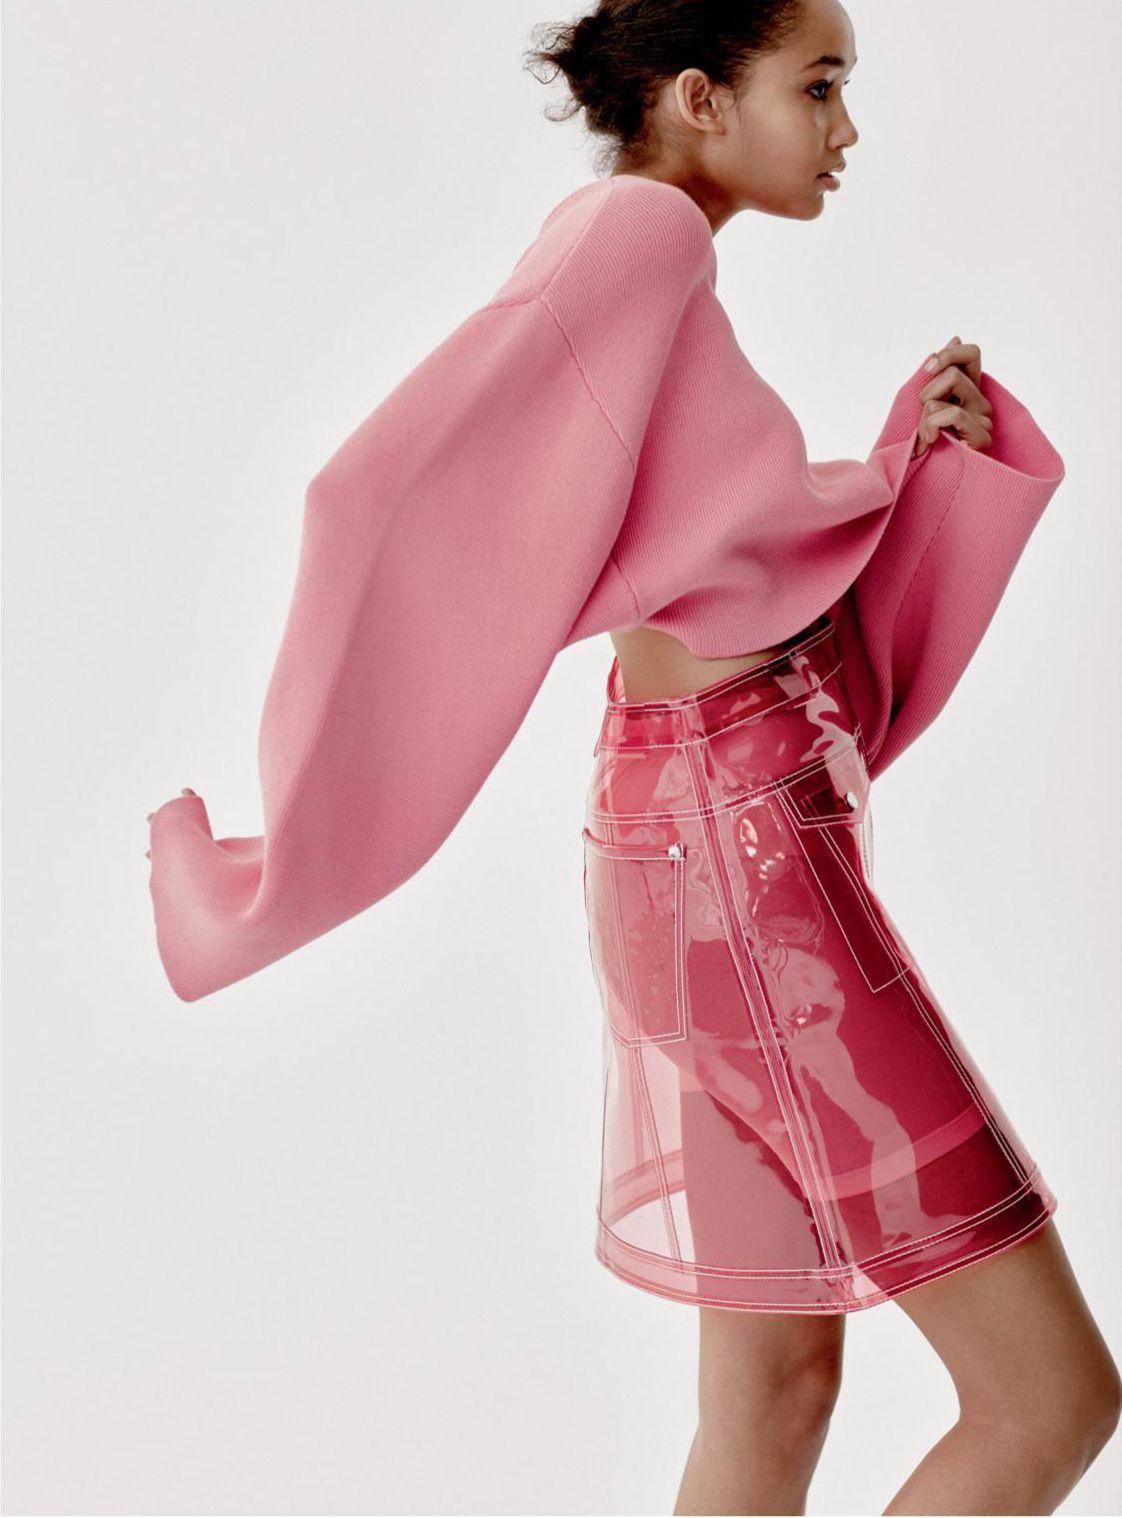 "artfulfashion: ""Wallette Watson in Vogue UK, May 2017, photographed by Luca Khouri """